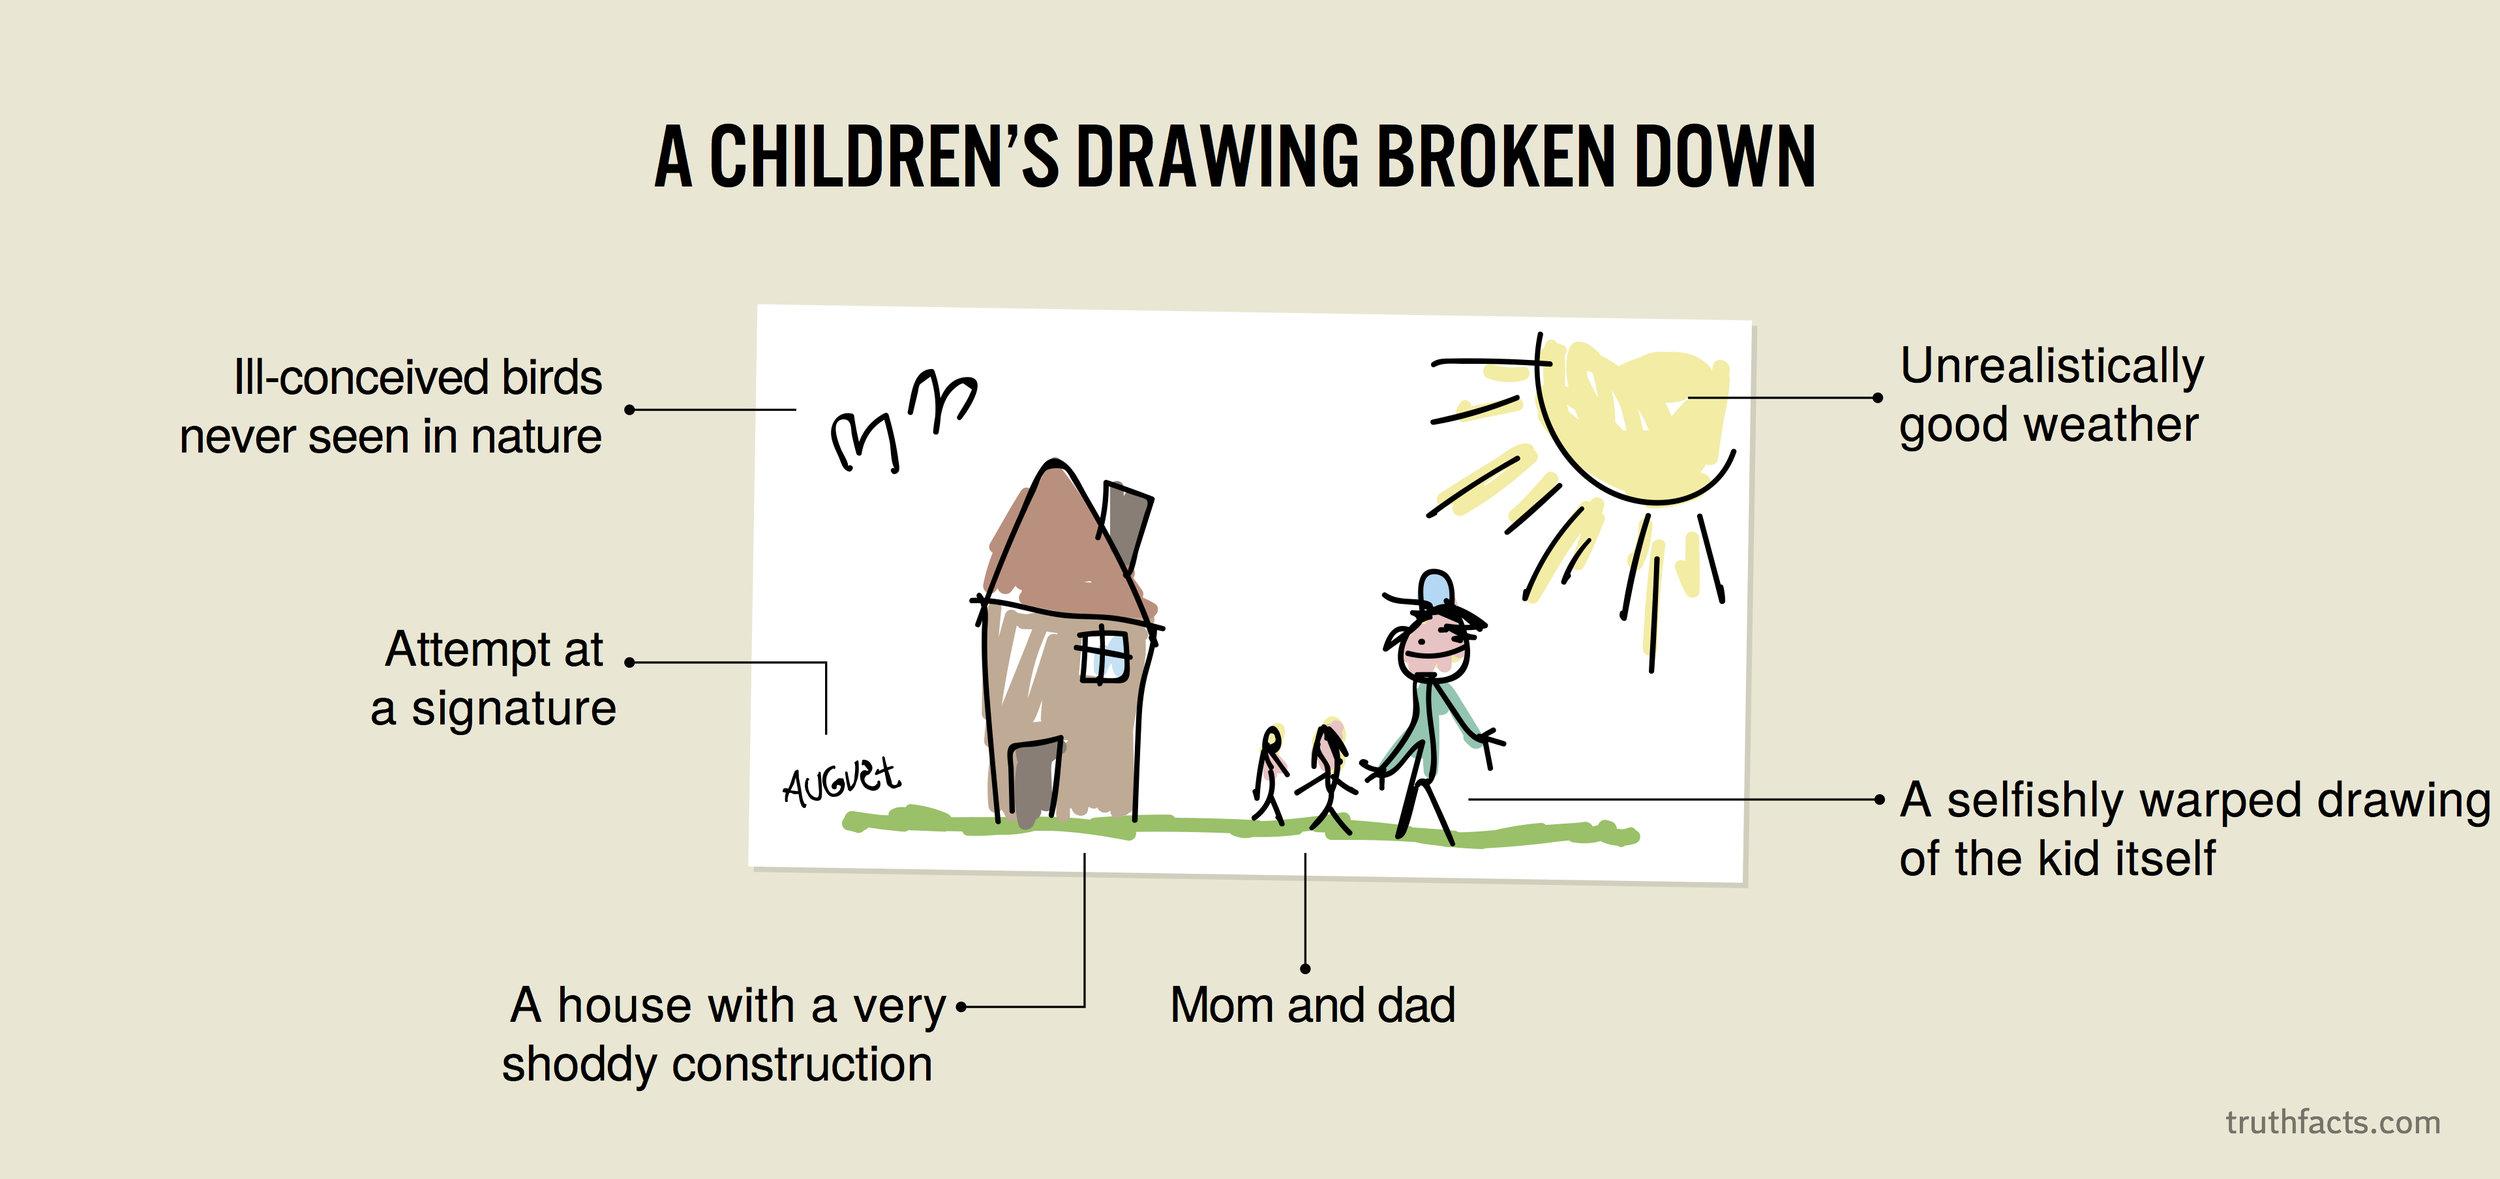 A children's drawing broken down